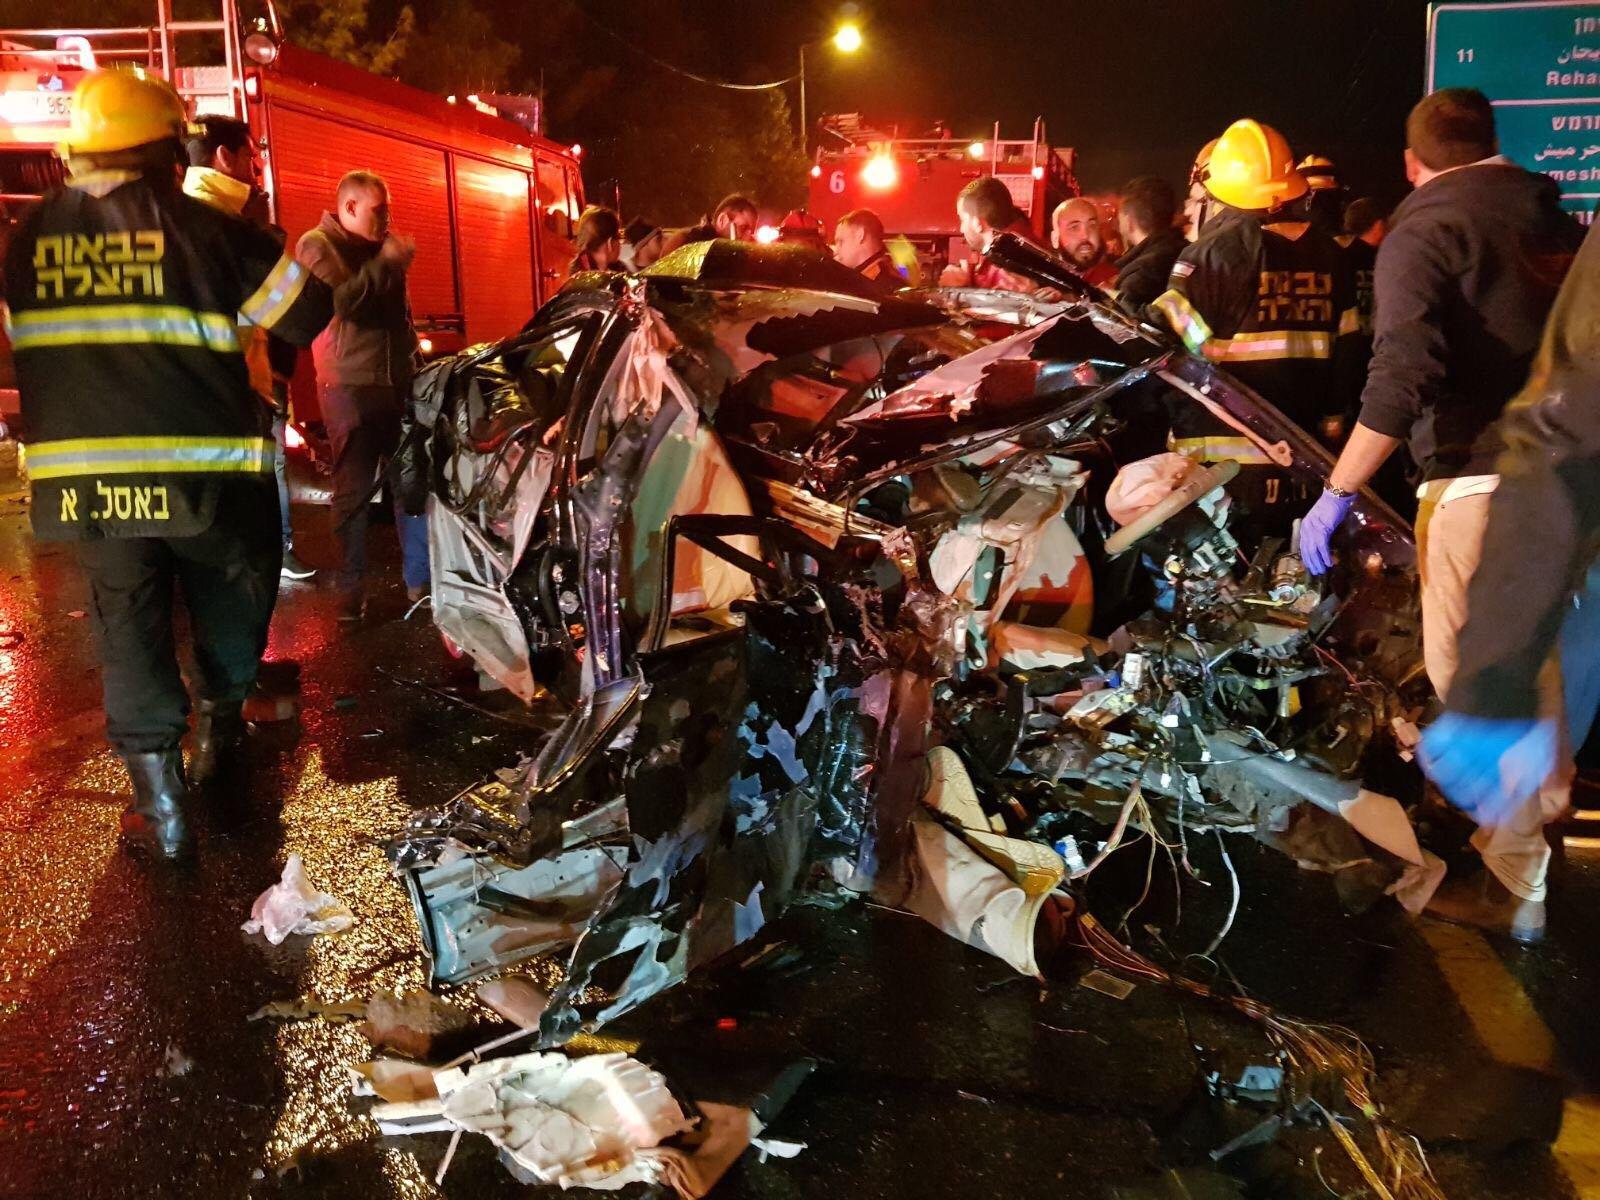 برطعة: حادث طرق مروّع، ومصرع شخصيّن